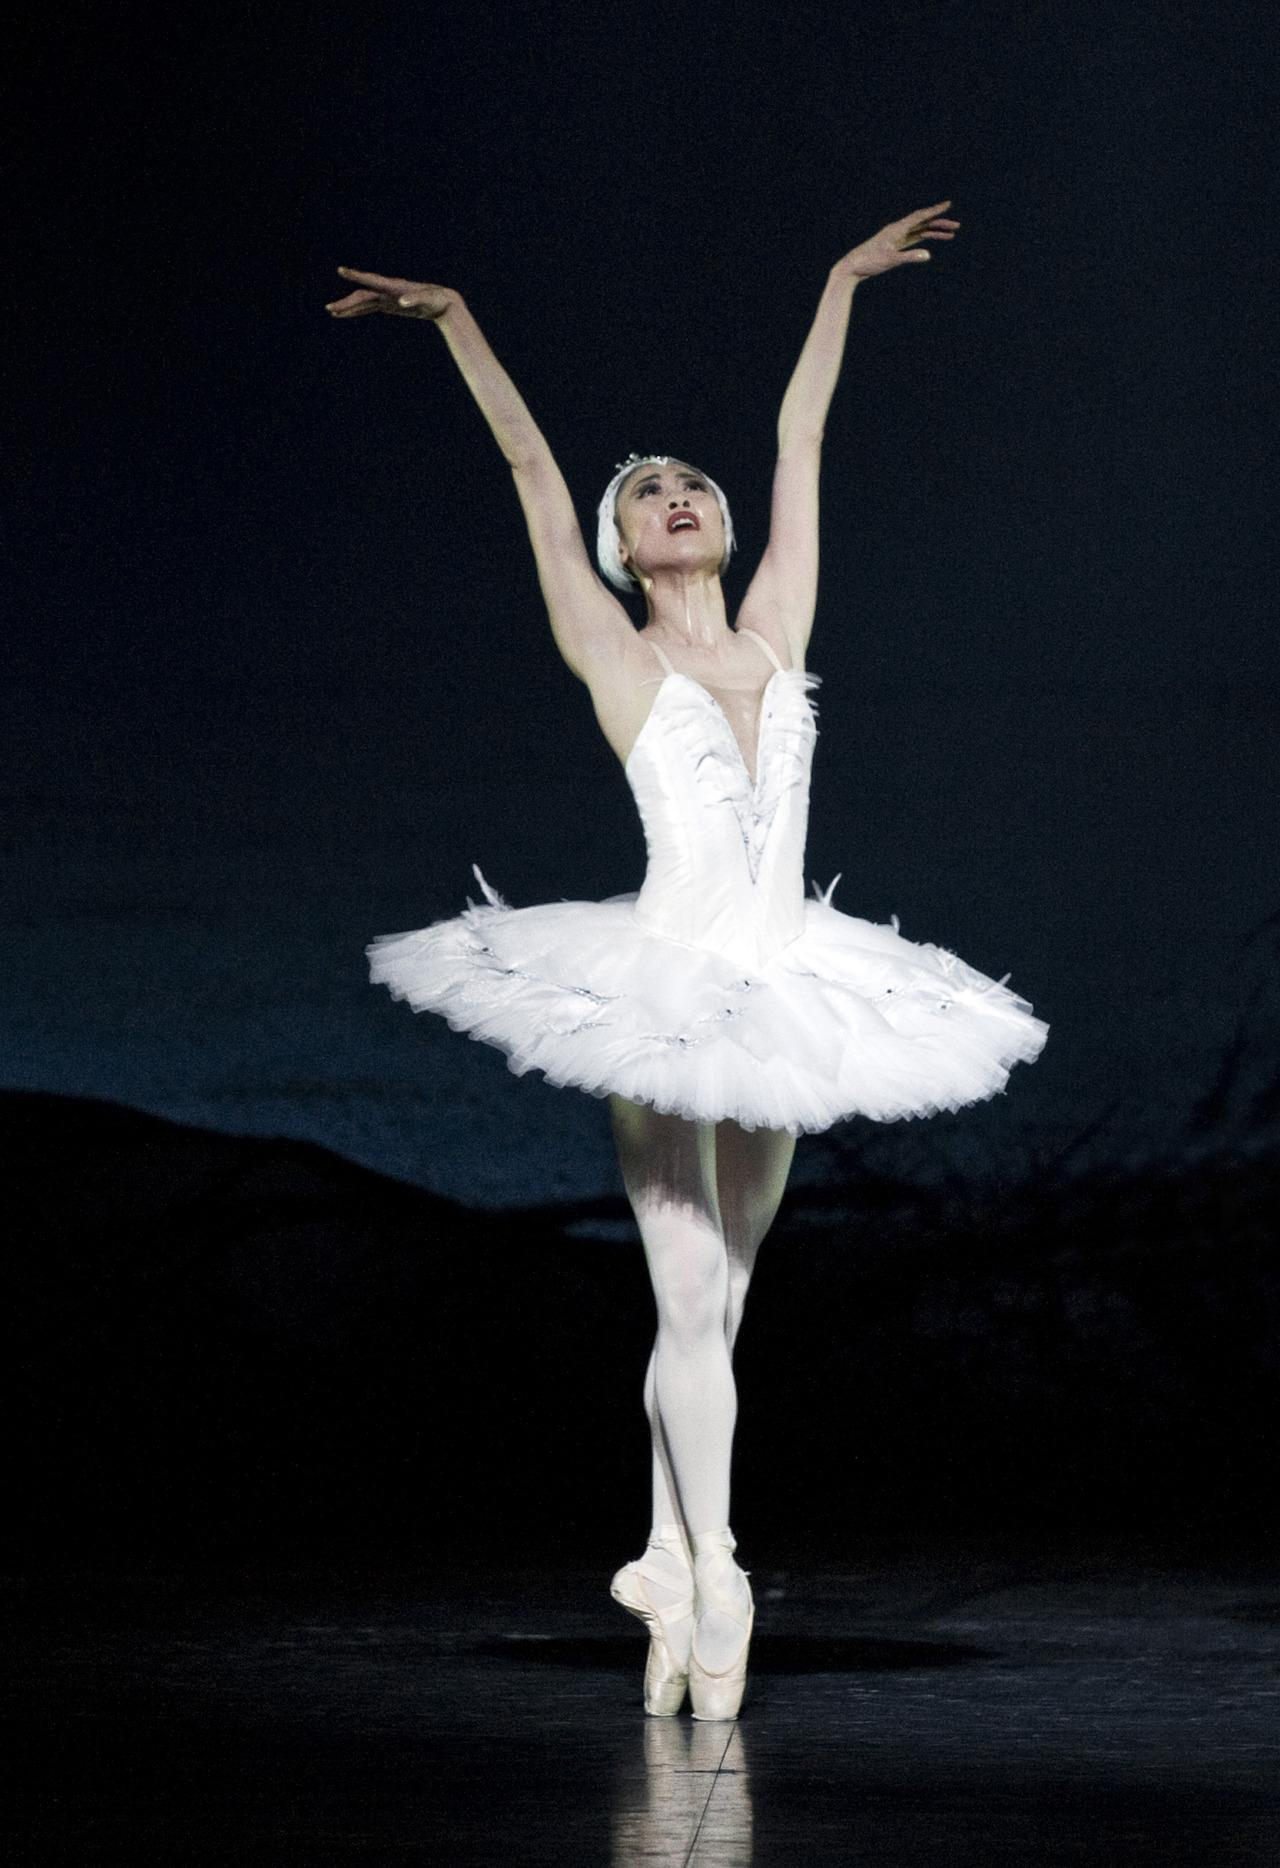 ballet poses | Back Yard Biology